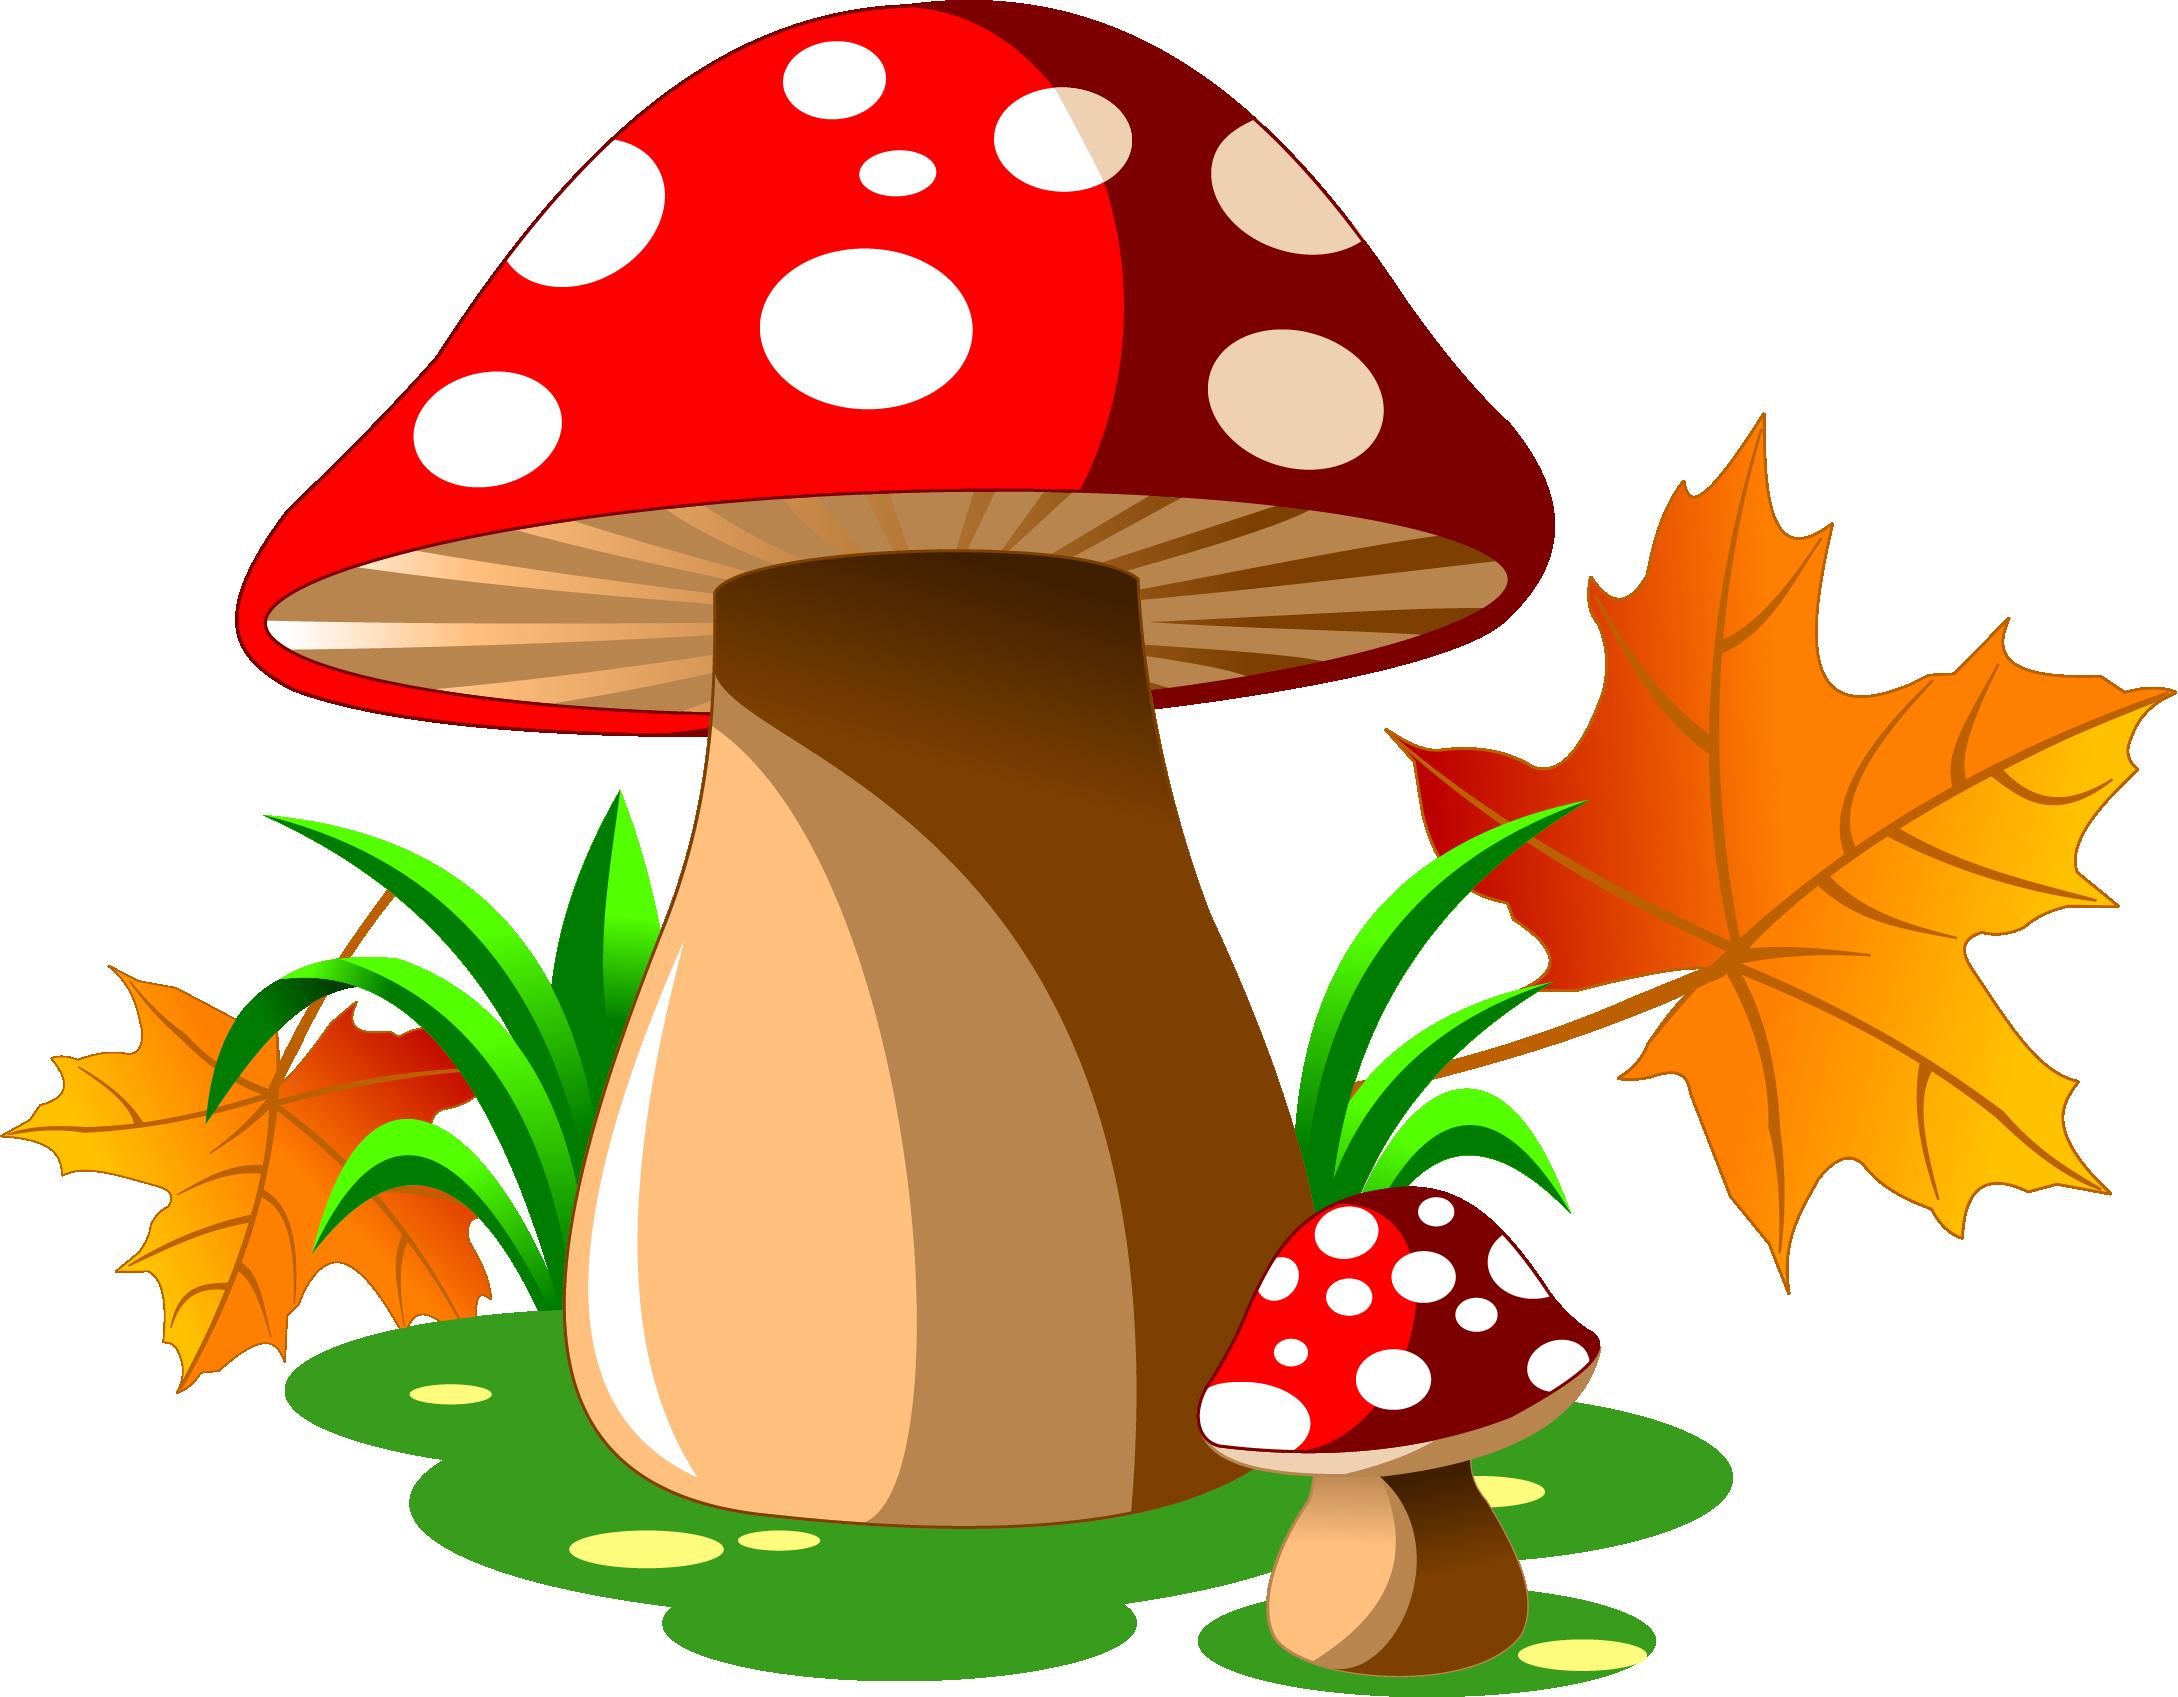 Cartoon royalty free illustration. Mushroom clipart mushroom tree